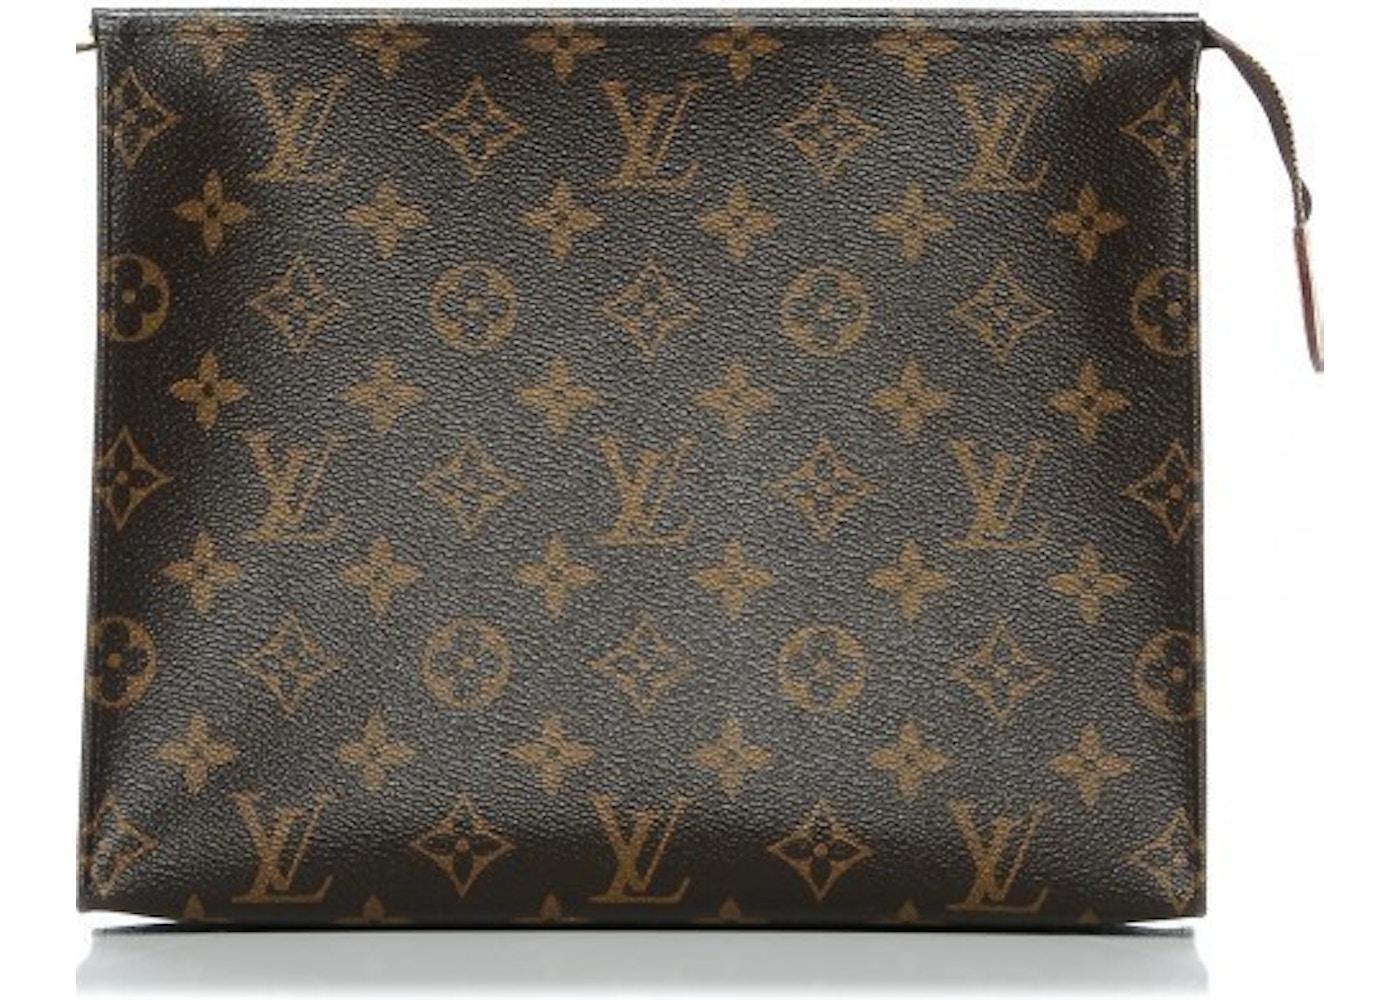 011bf1f7058c Louis Vuitton Pouch Toiletry Monogram 26 Brown. Monogram 26 Brown